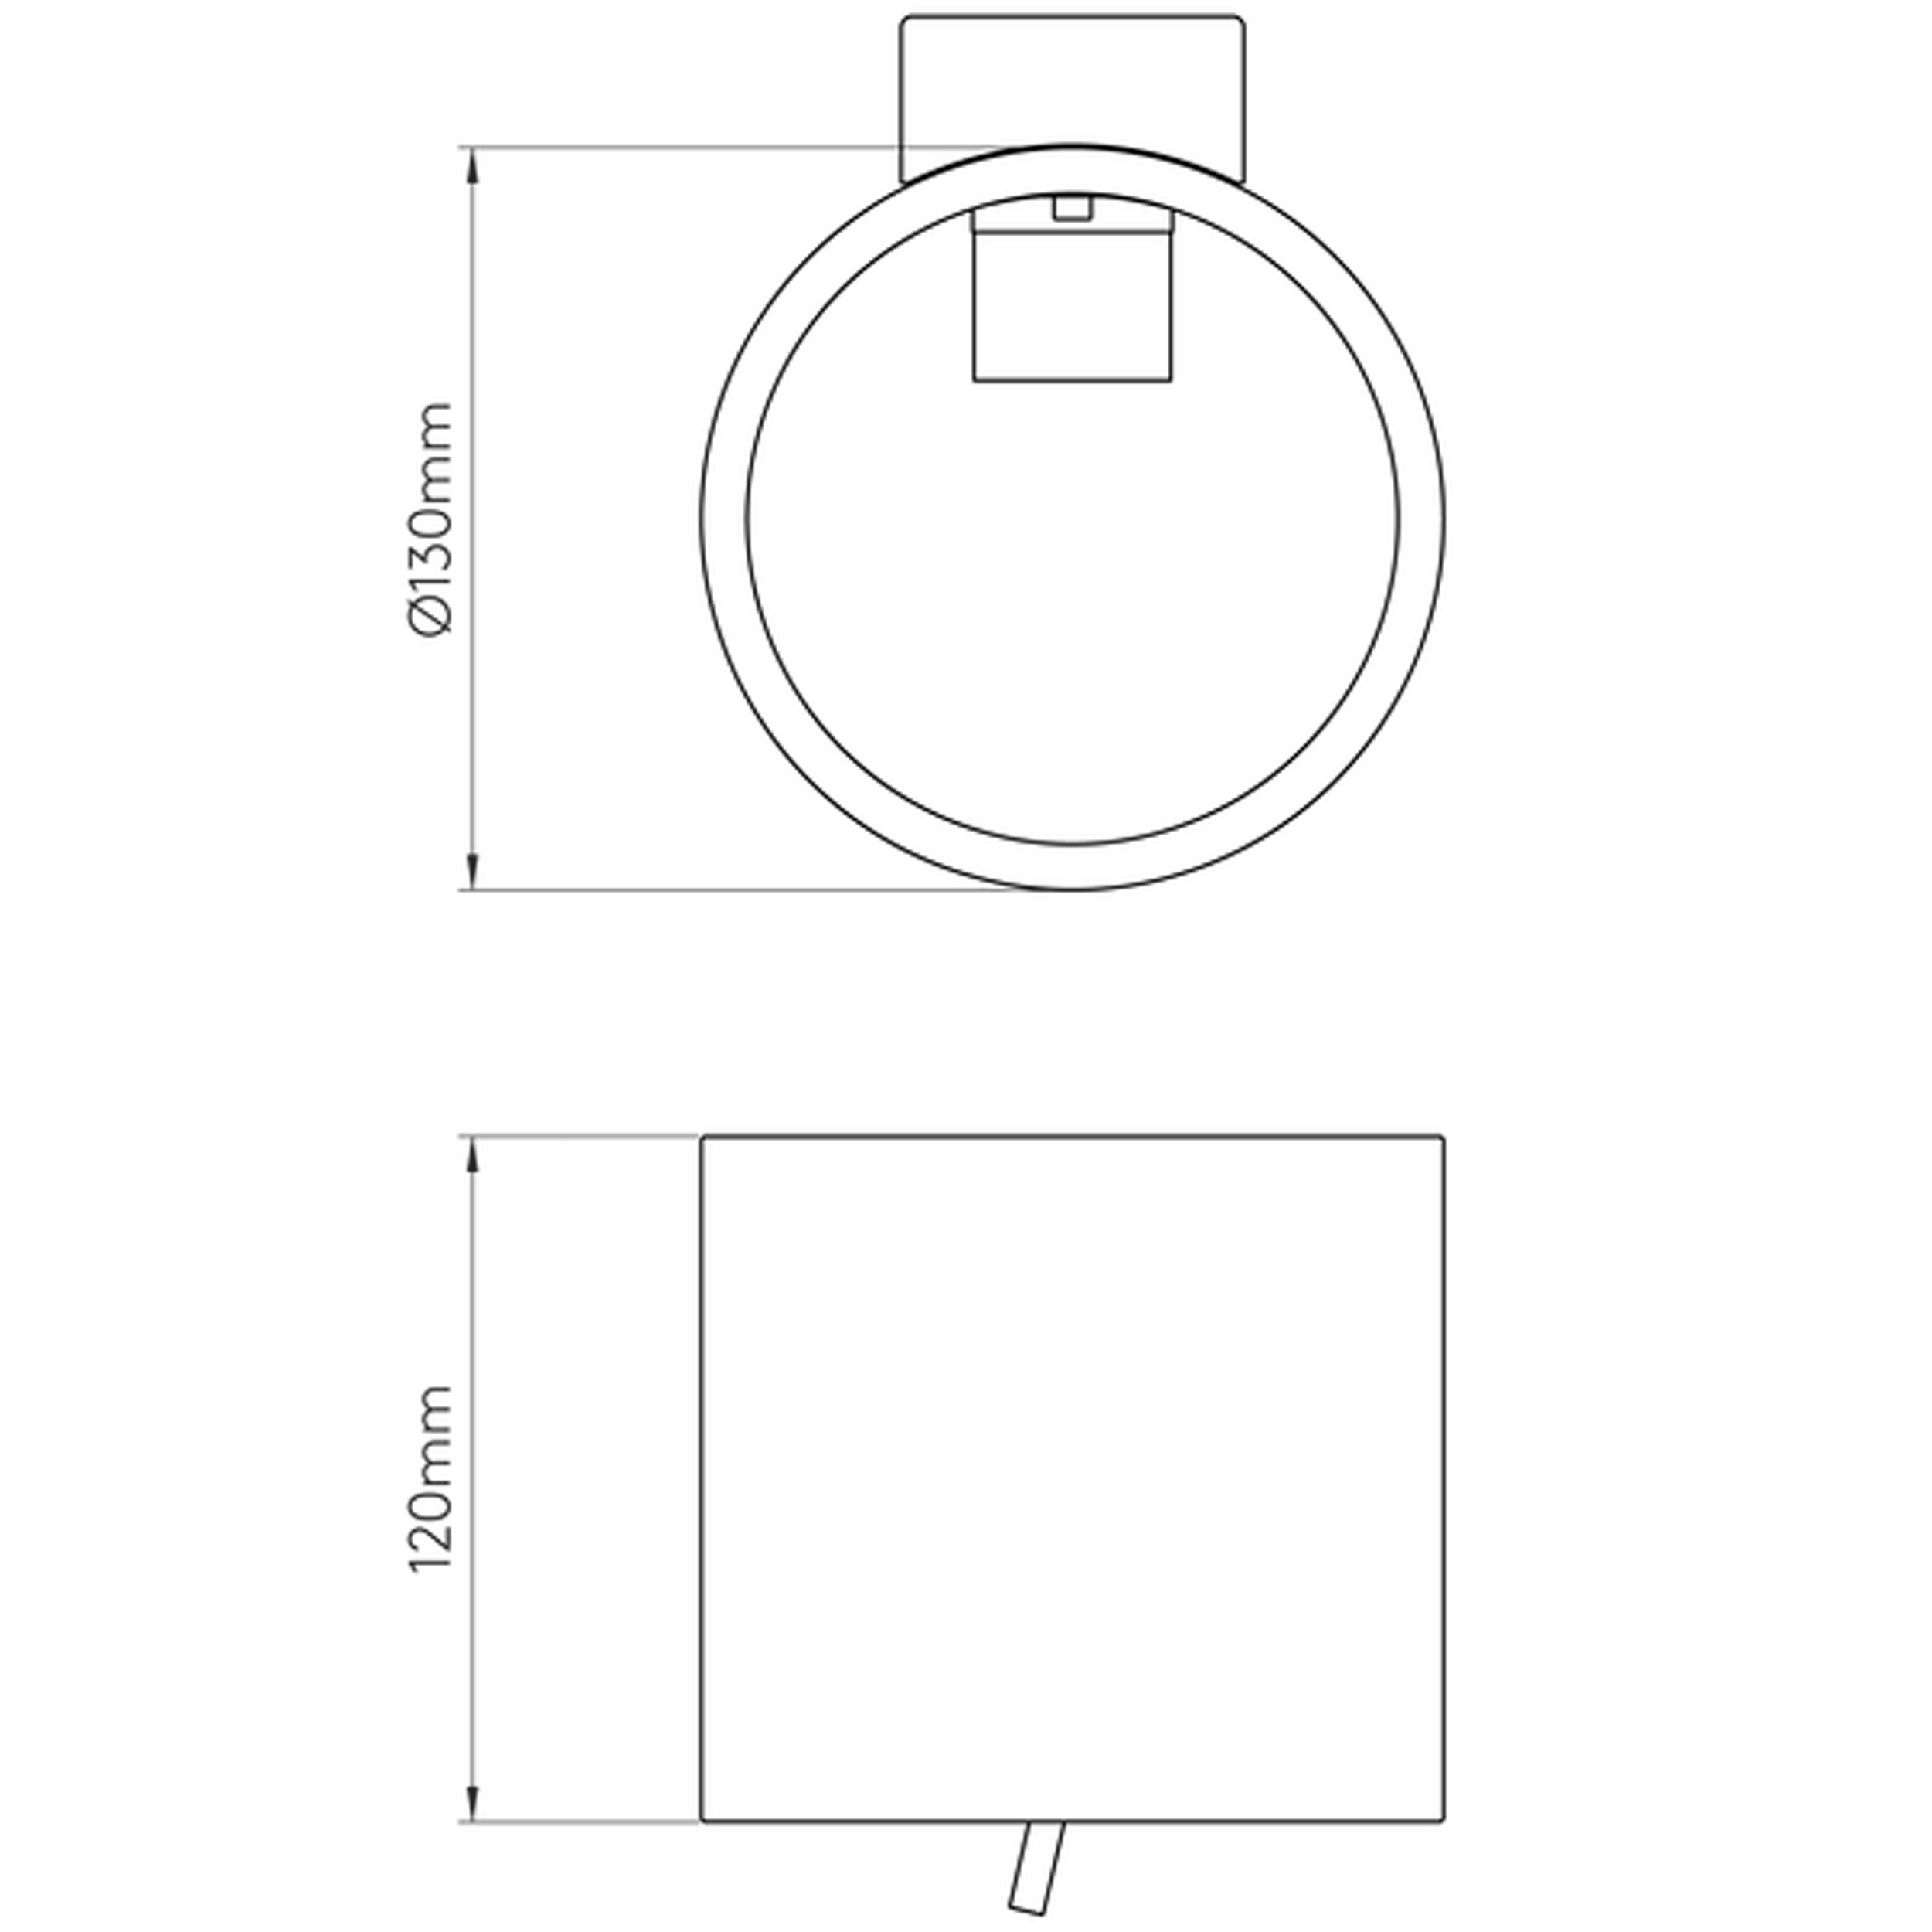 Astro Brenta 130 Wall Light Line Drawing